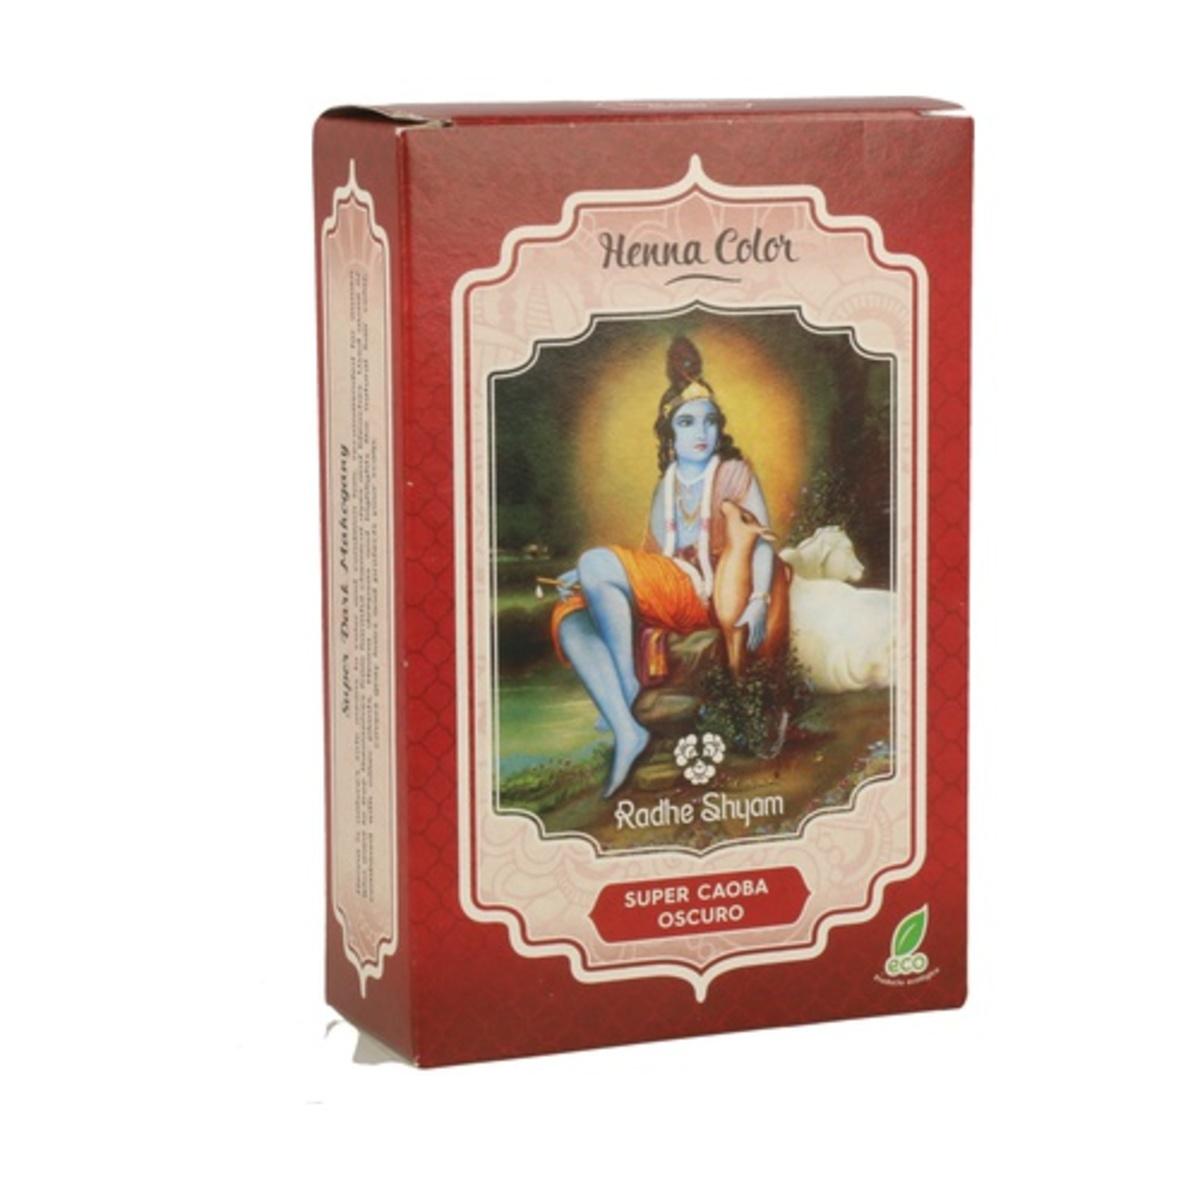 Henna Supercaoba Polvo 100g. Radhe Shyam